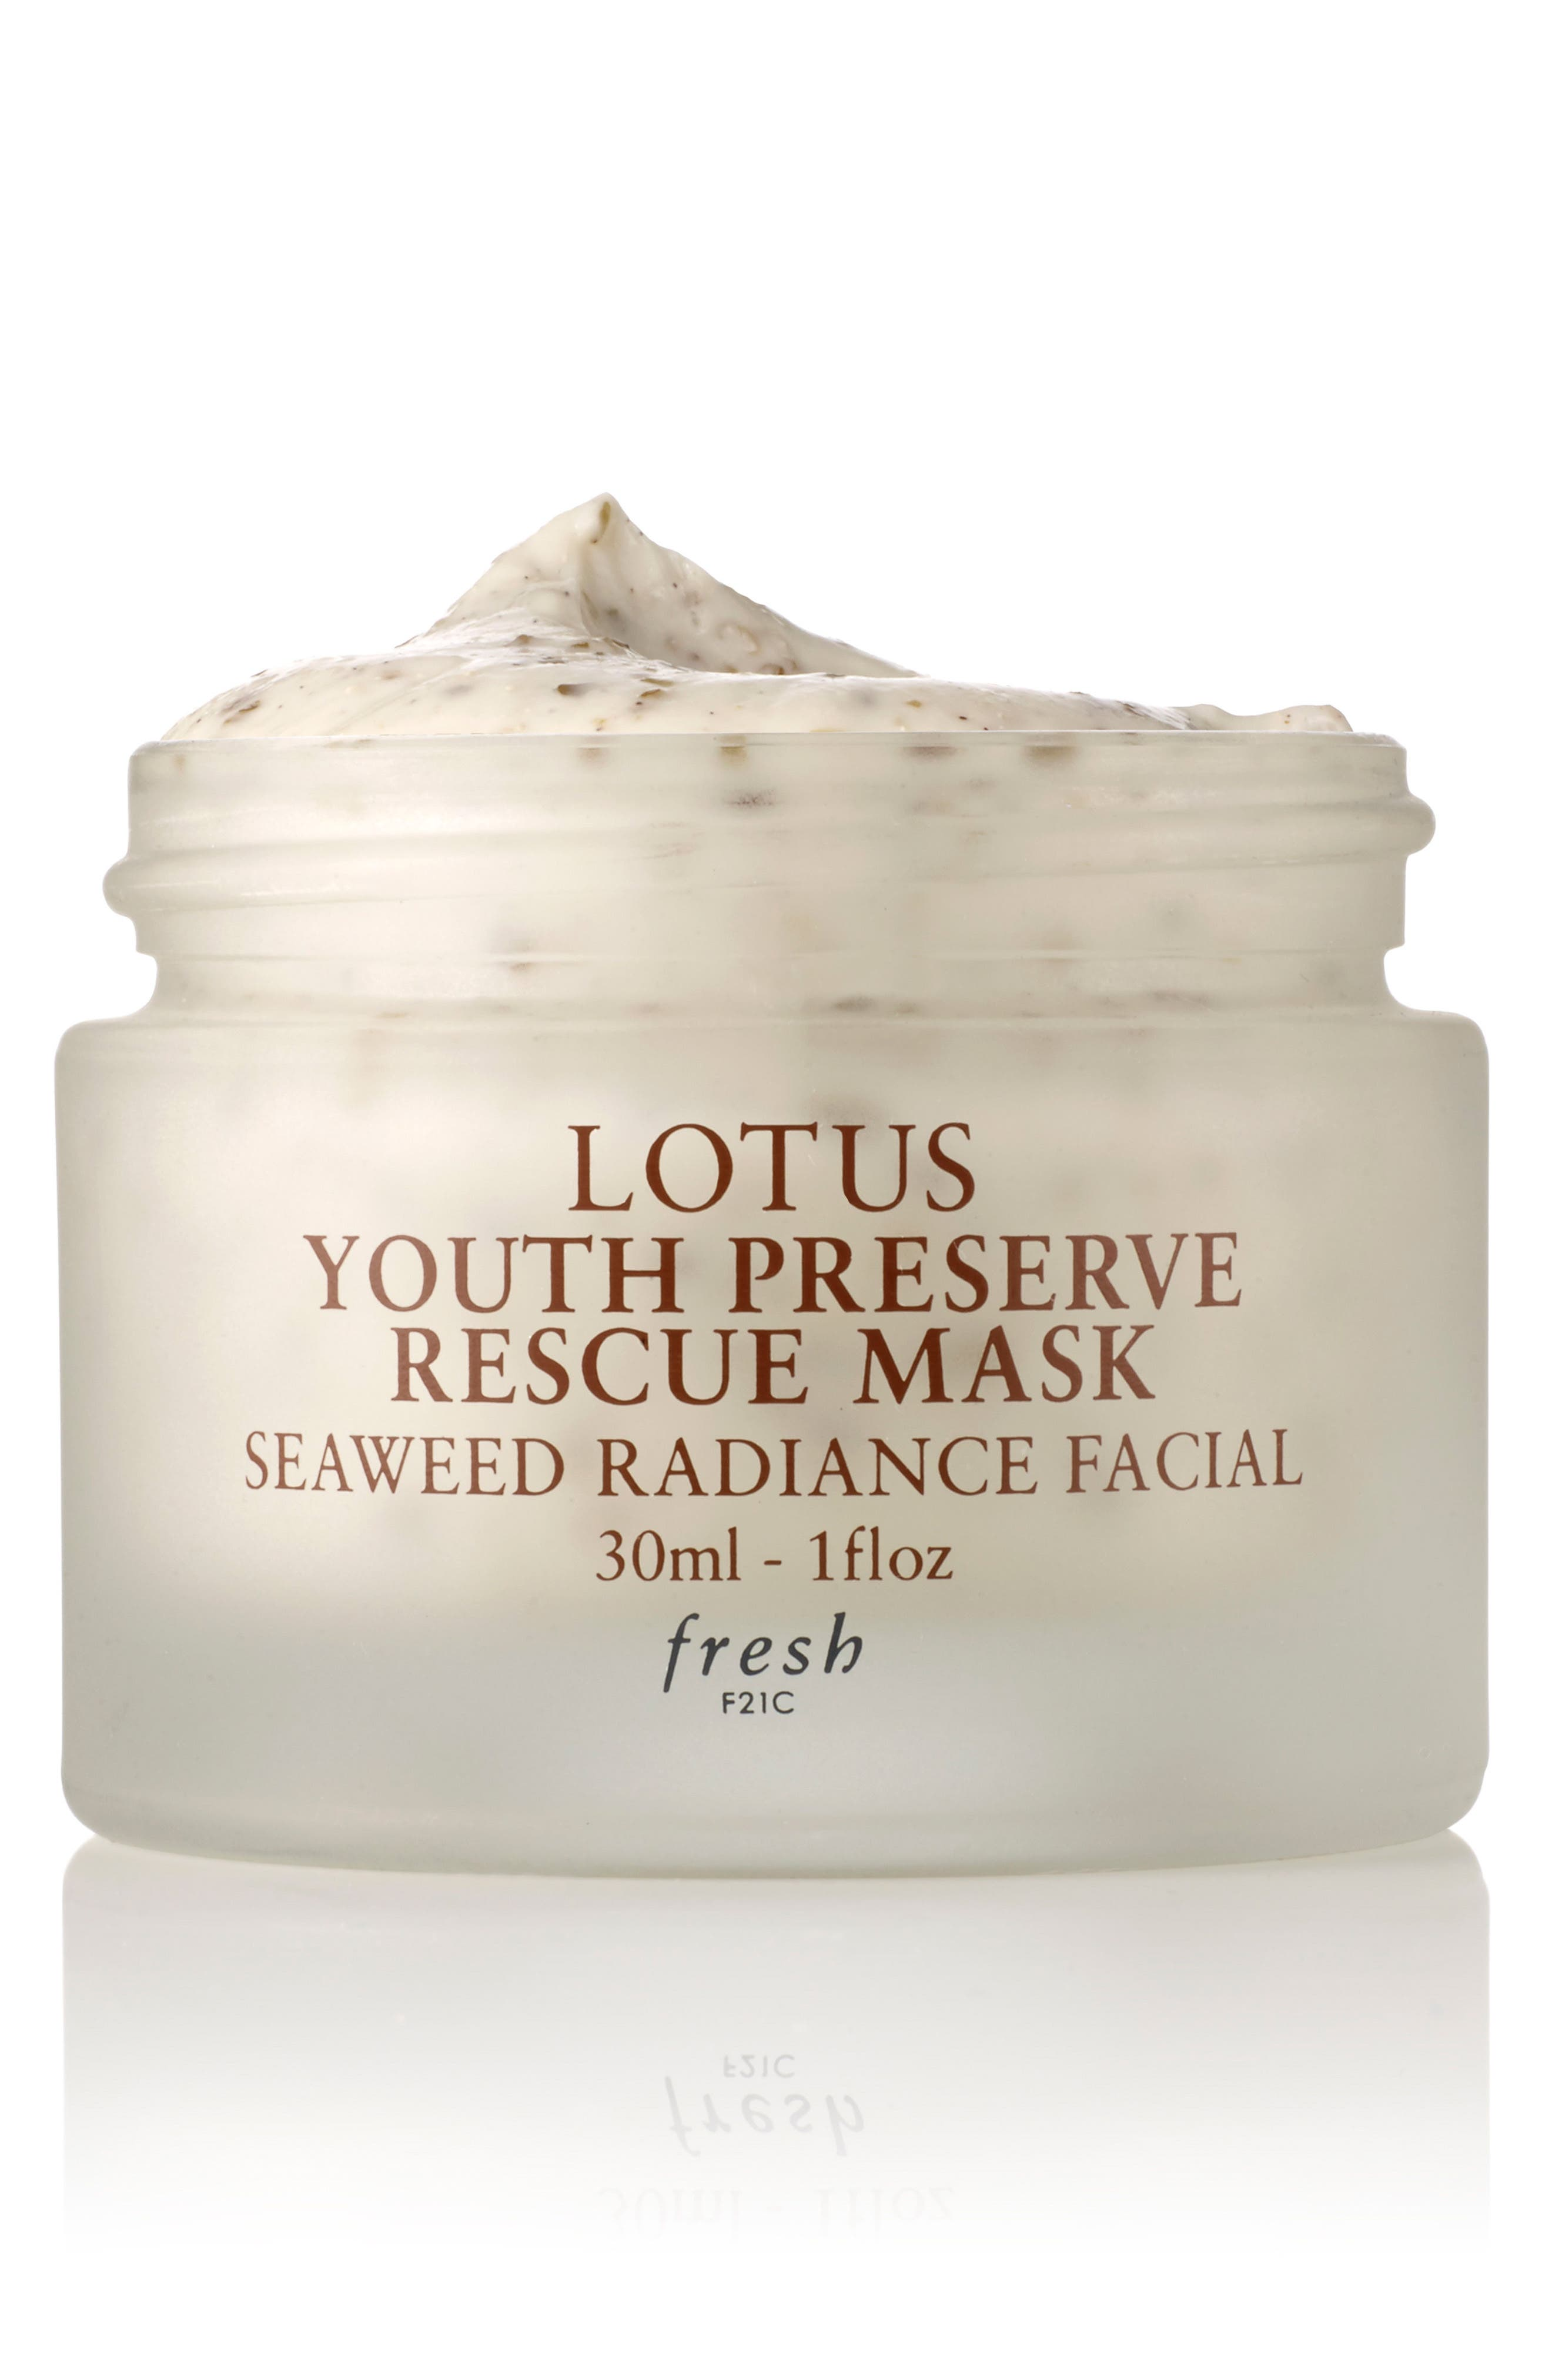 Lotus Youth Preserve Rescue Mask,                             Main thumbnail 1, color,                             No Color